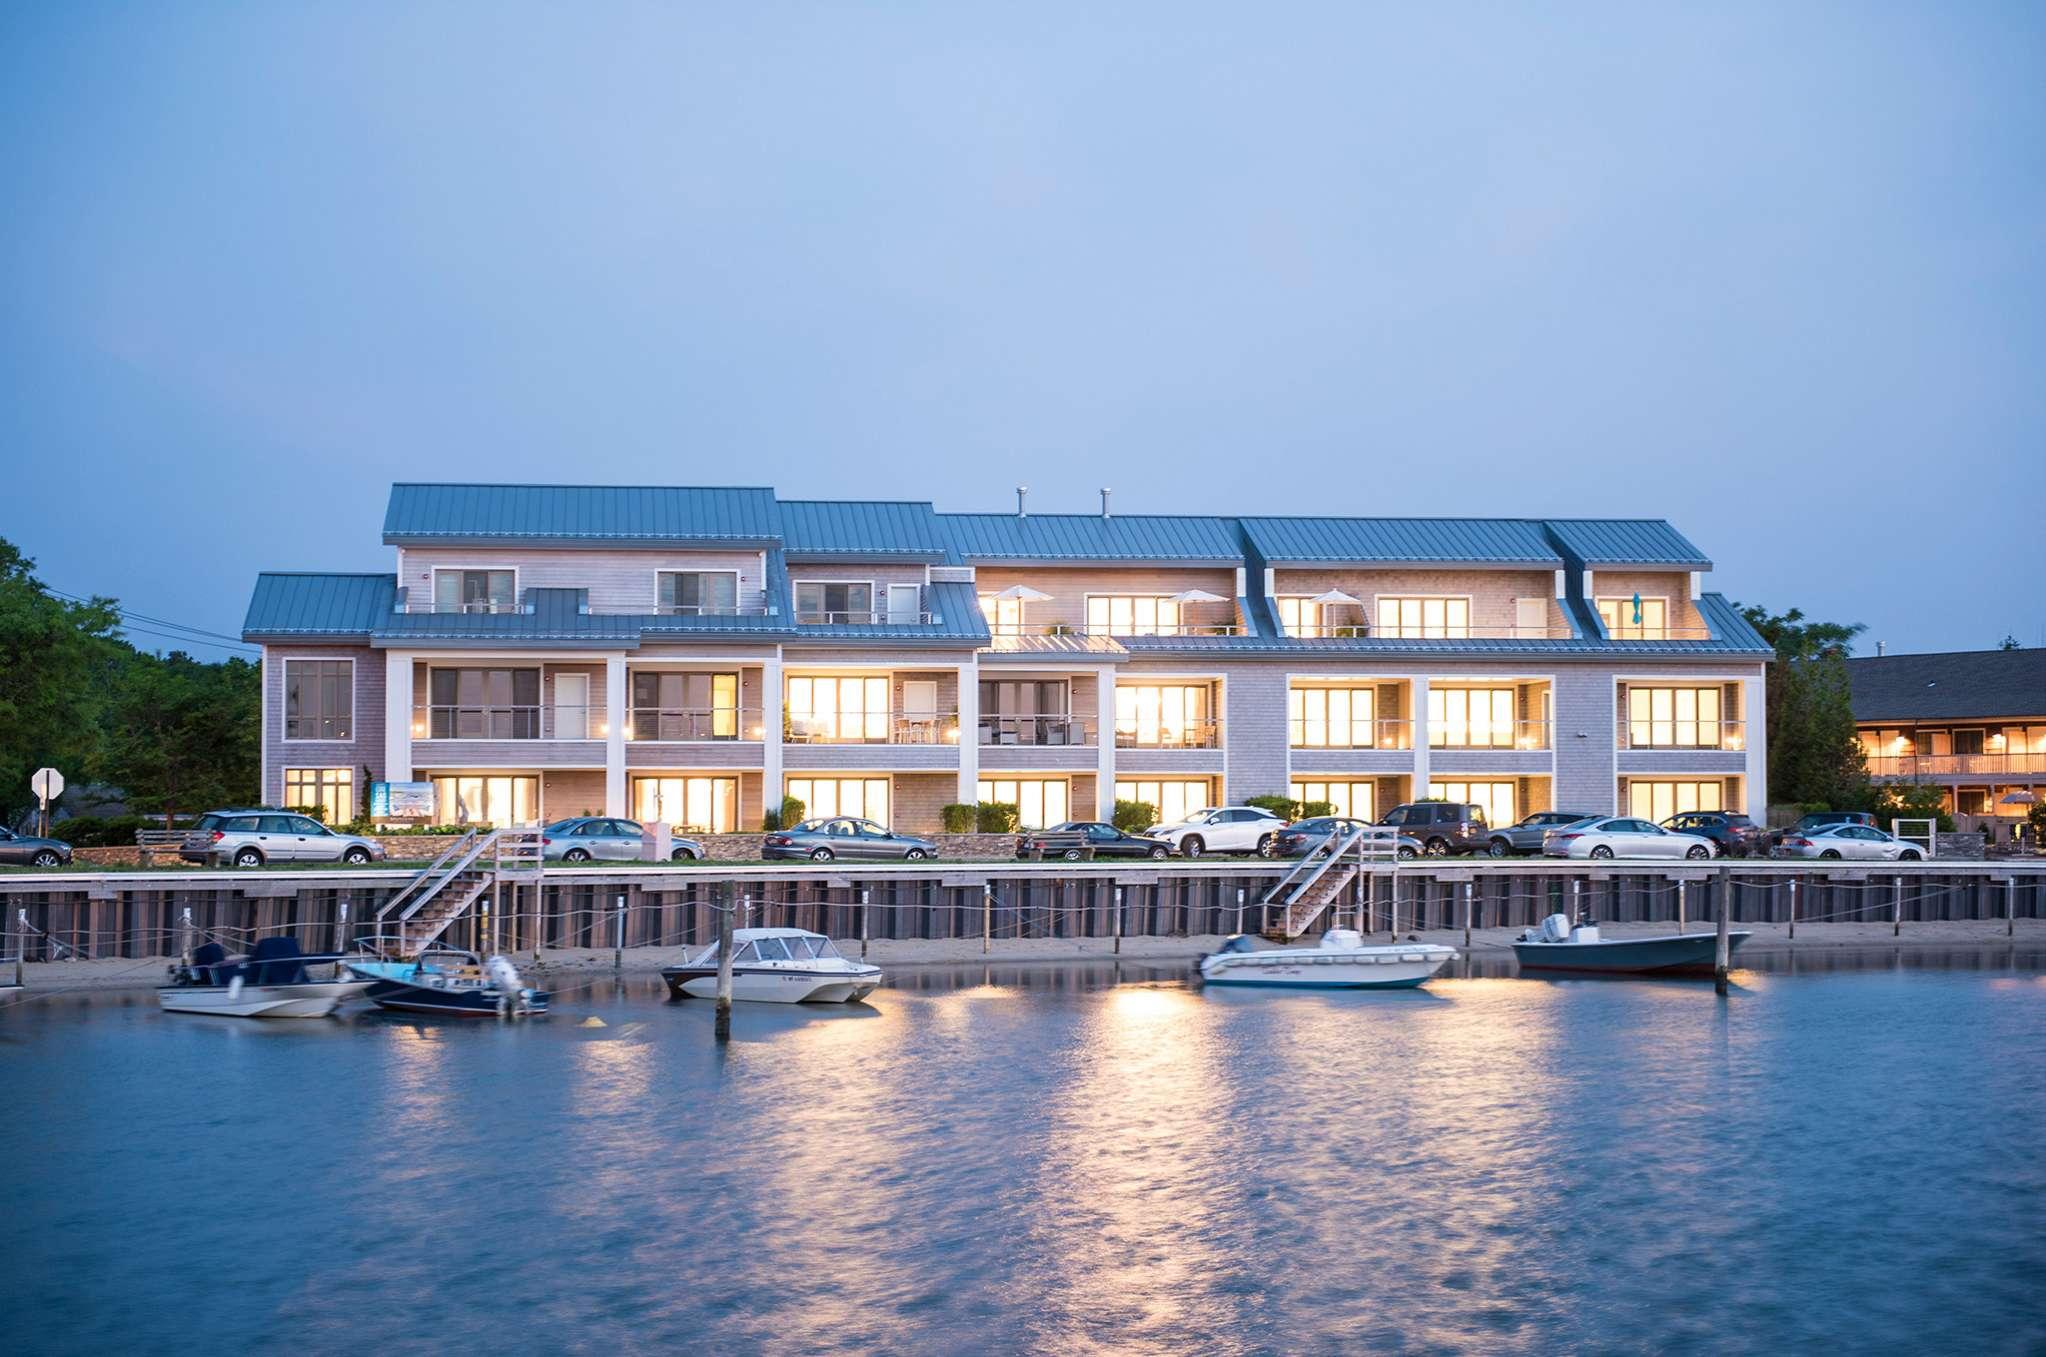 Condominium for Sale at Harbor's Edge - Resort Lifestyle In Sag Harbor 21 West Water Street, 2b, Sag Harbor, New York